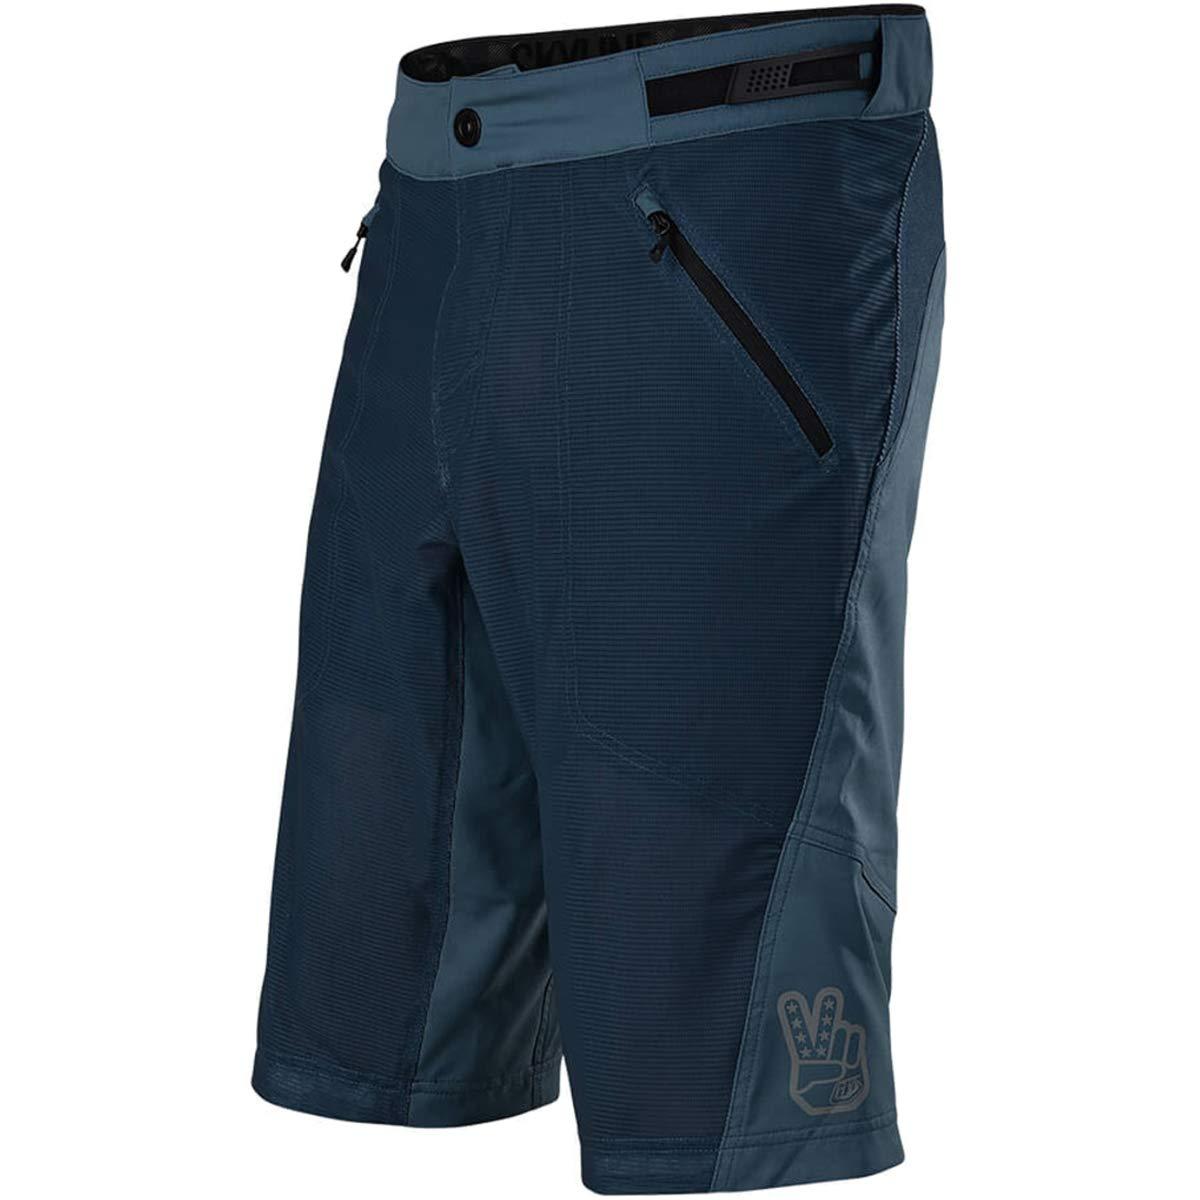 Troy Lee Designs Skyline Air Short - Men's Solid Air Force Blue, 30